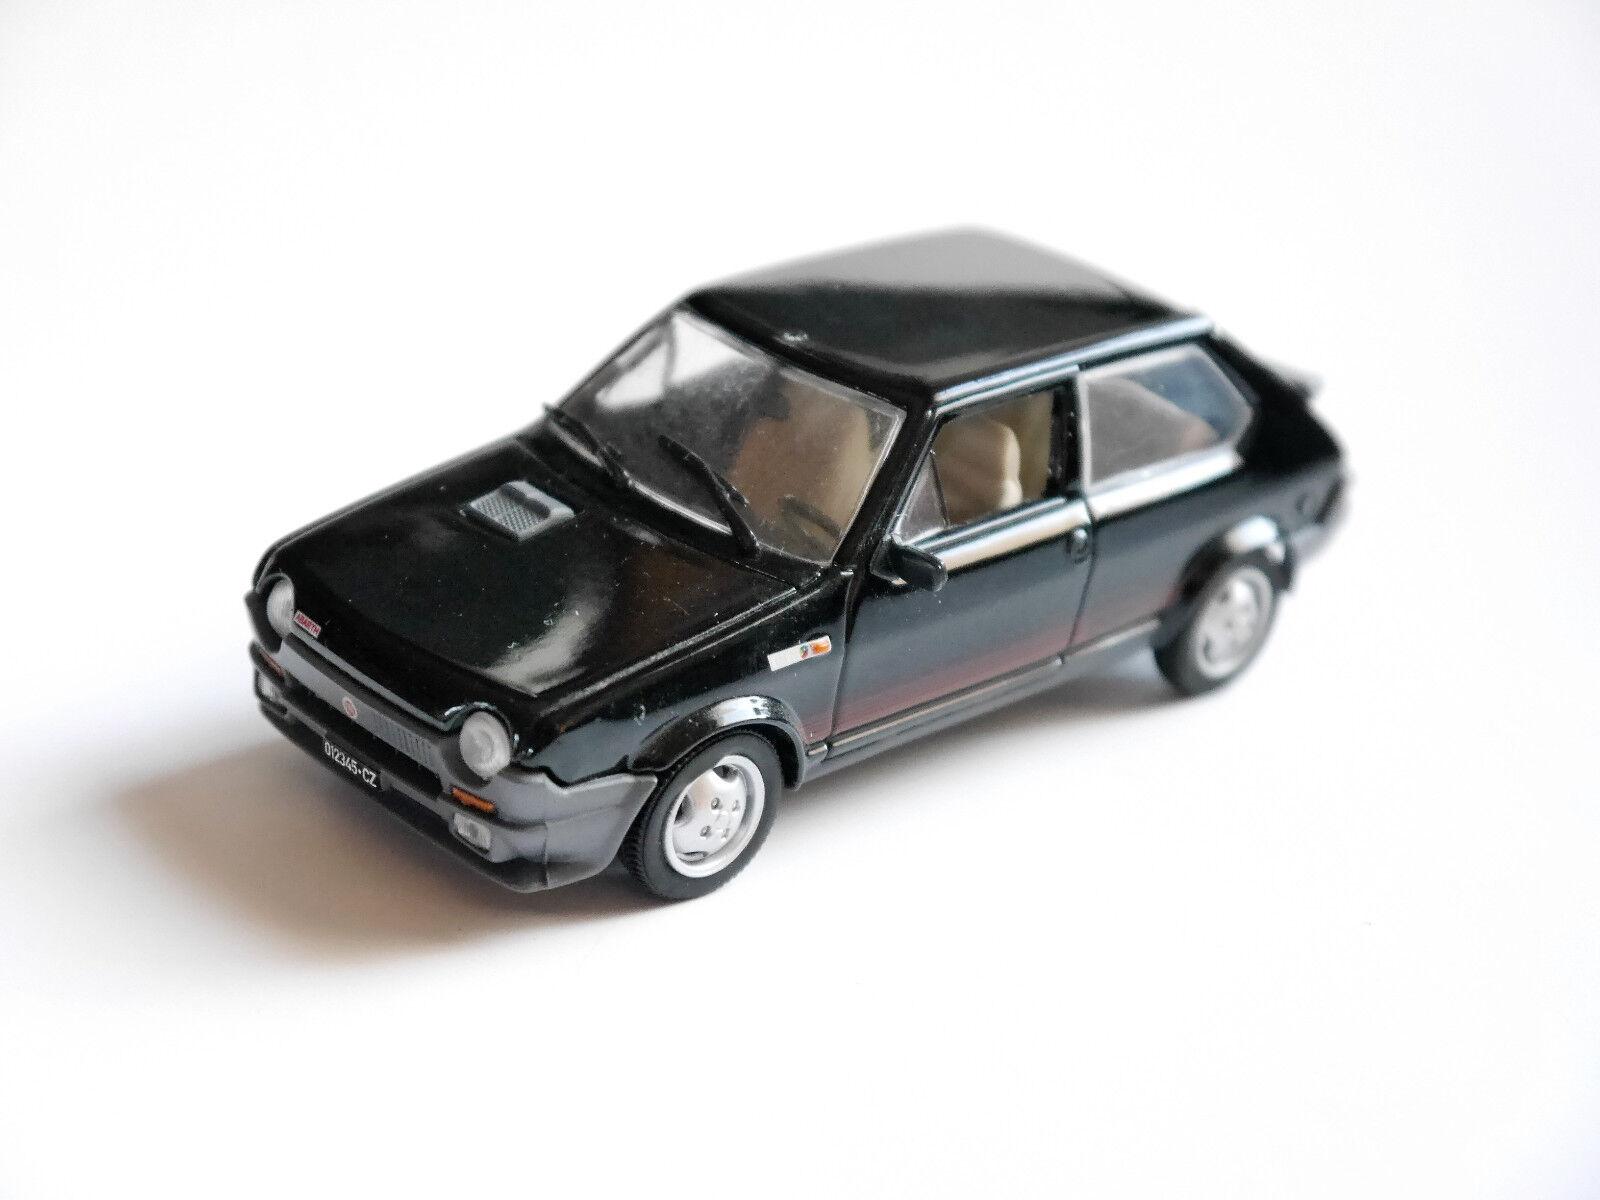 Fiat Ritmo Abarth 2000 en nero Nero nero estrella negra nero, Ixo en 1 43